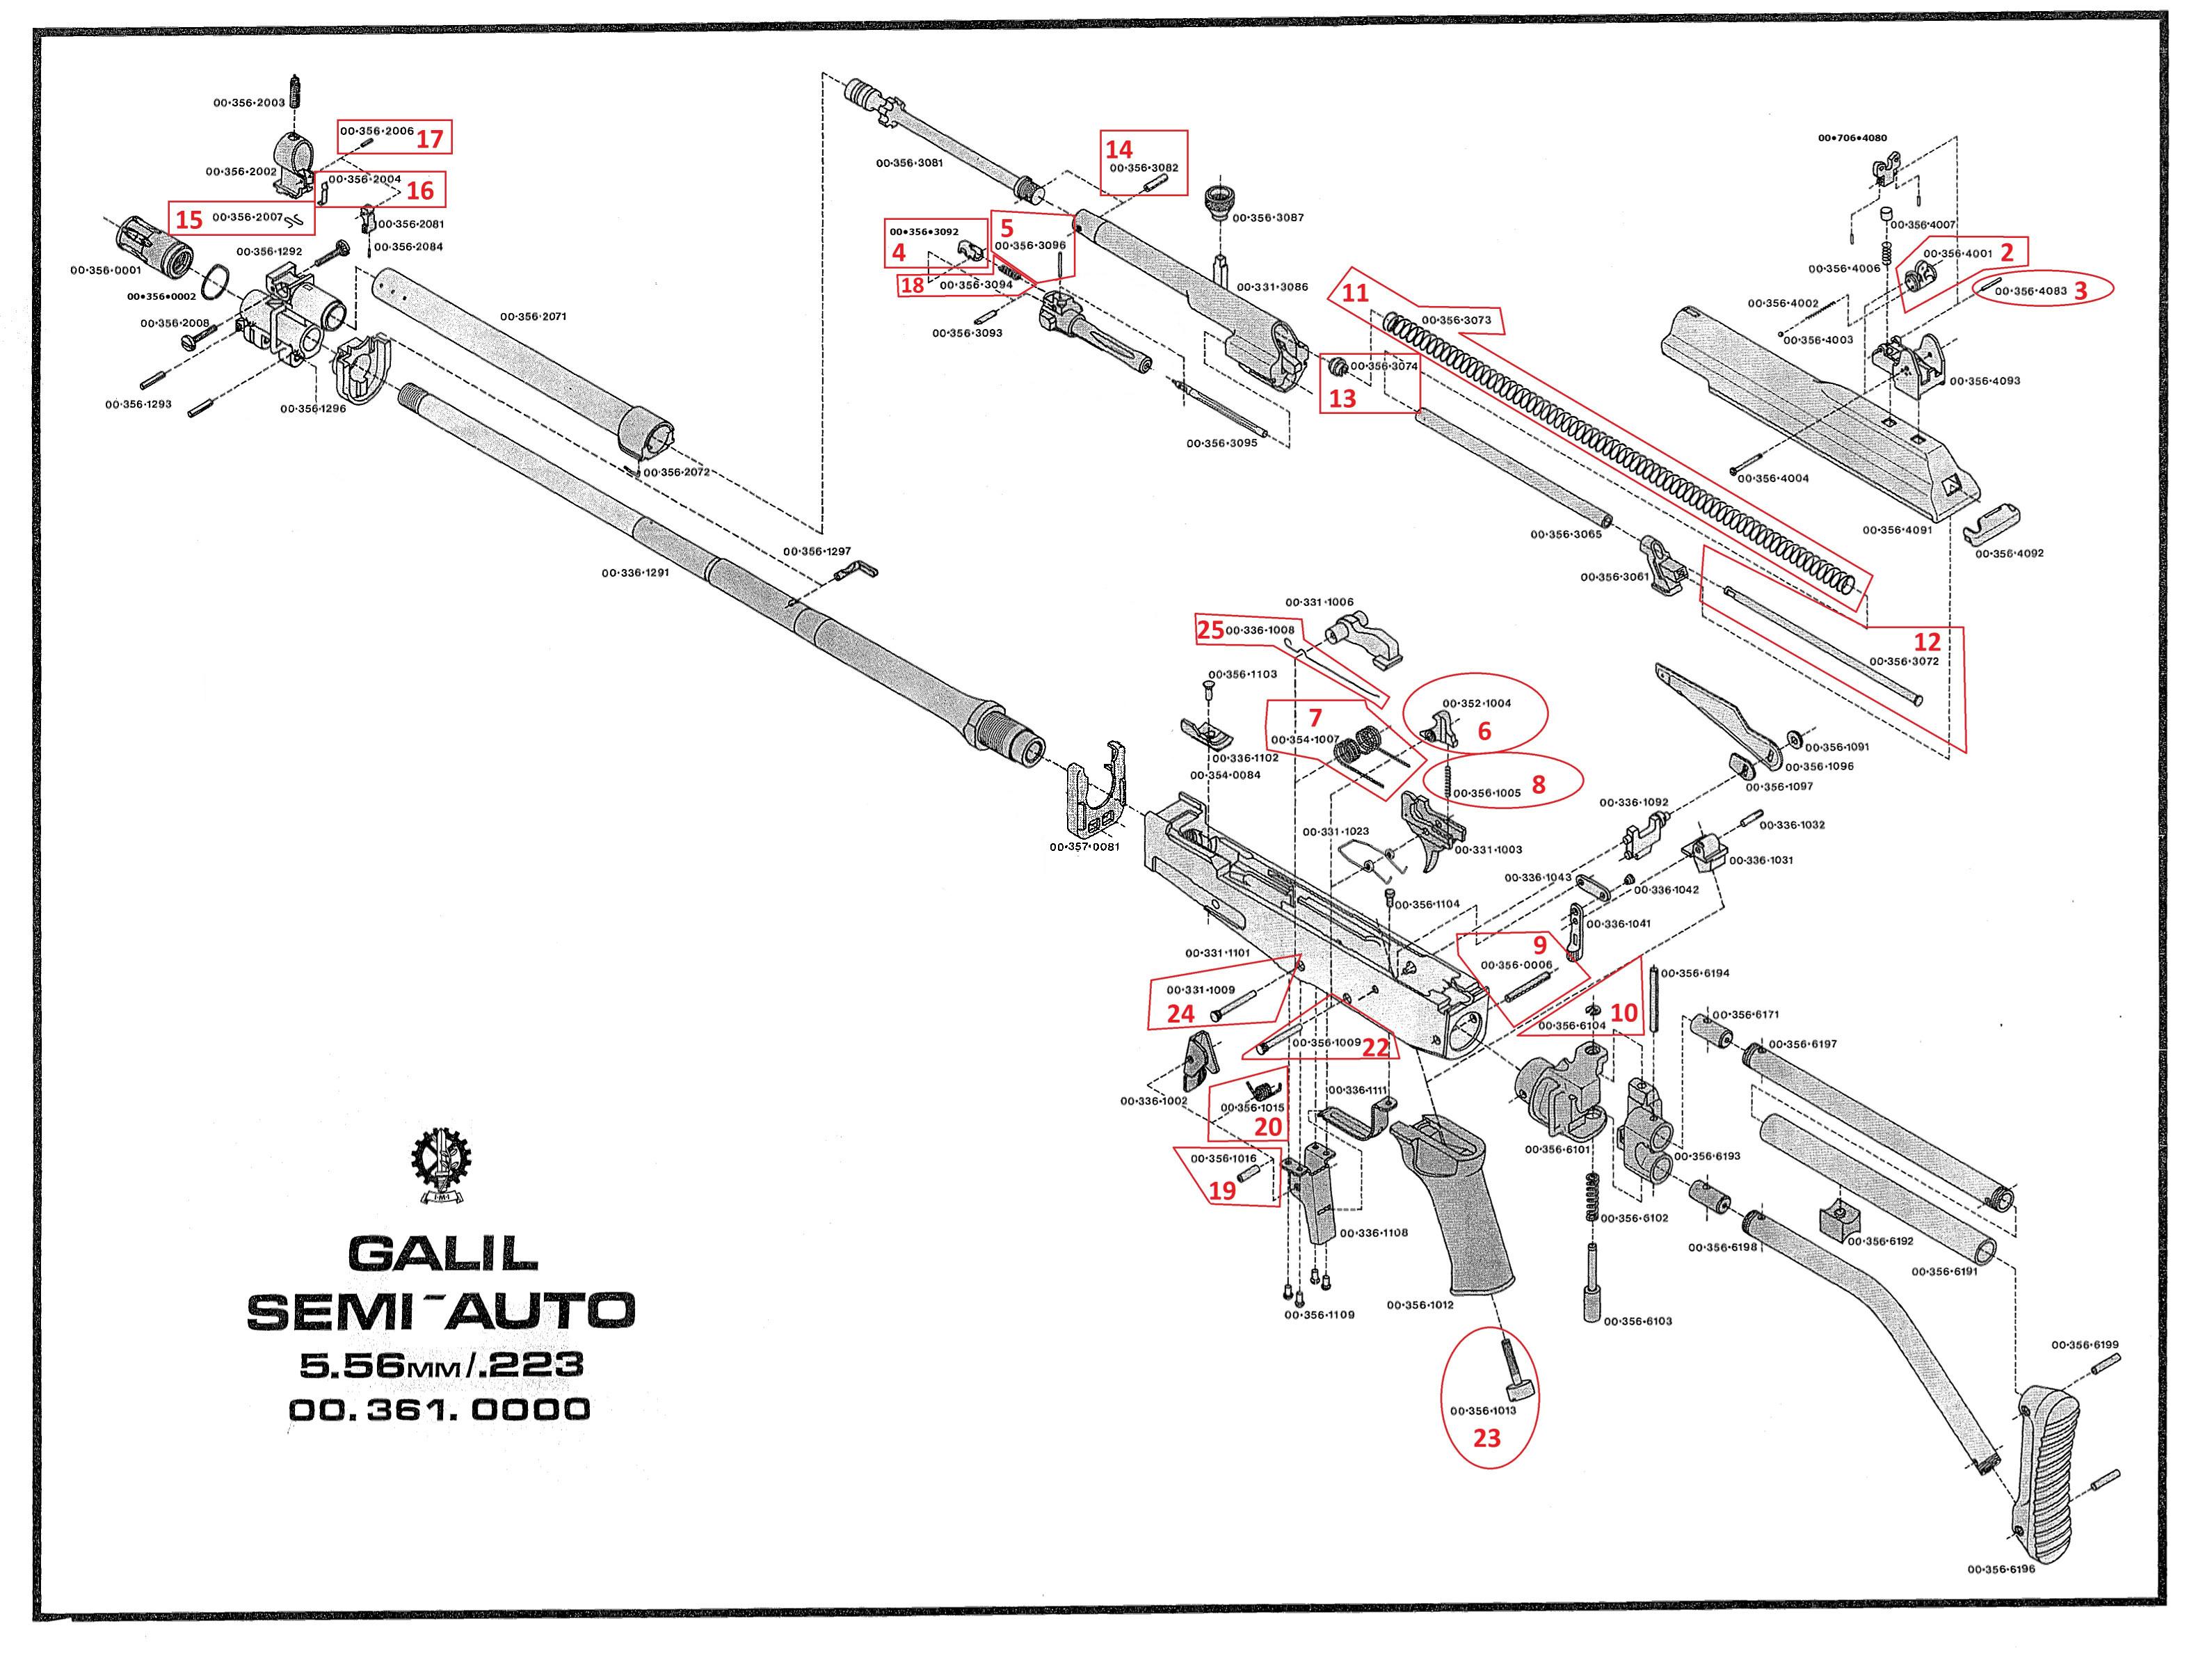 tavor parts diagram - 28 images